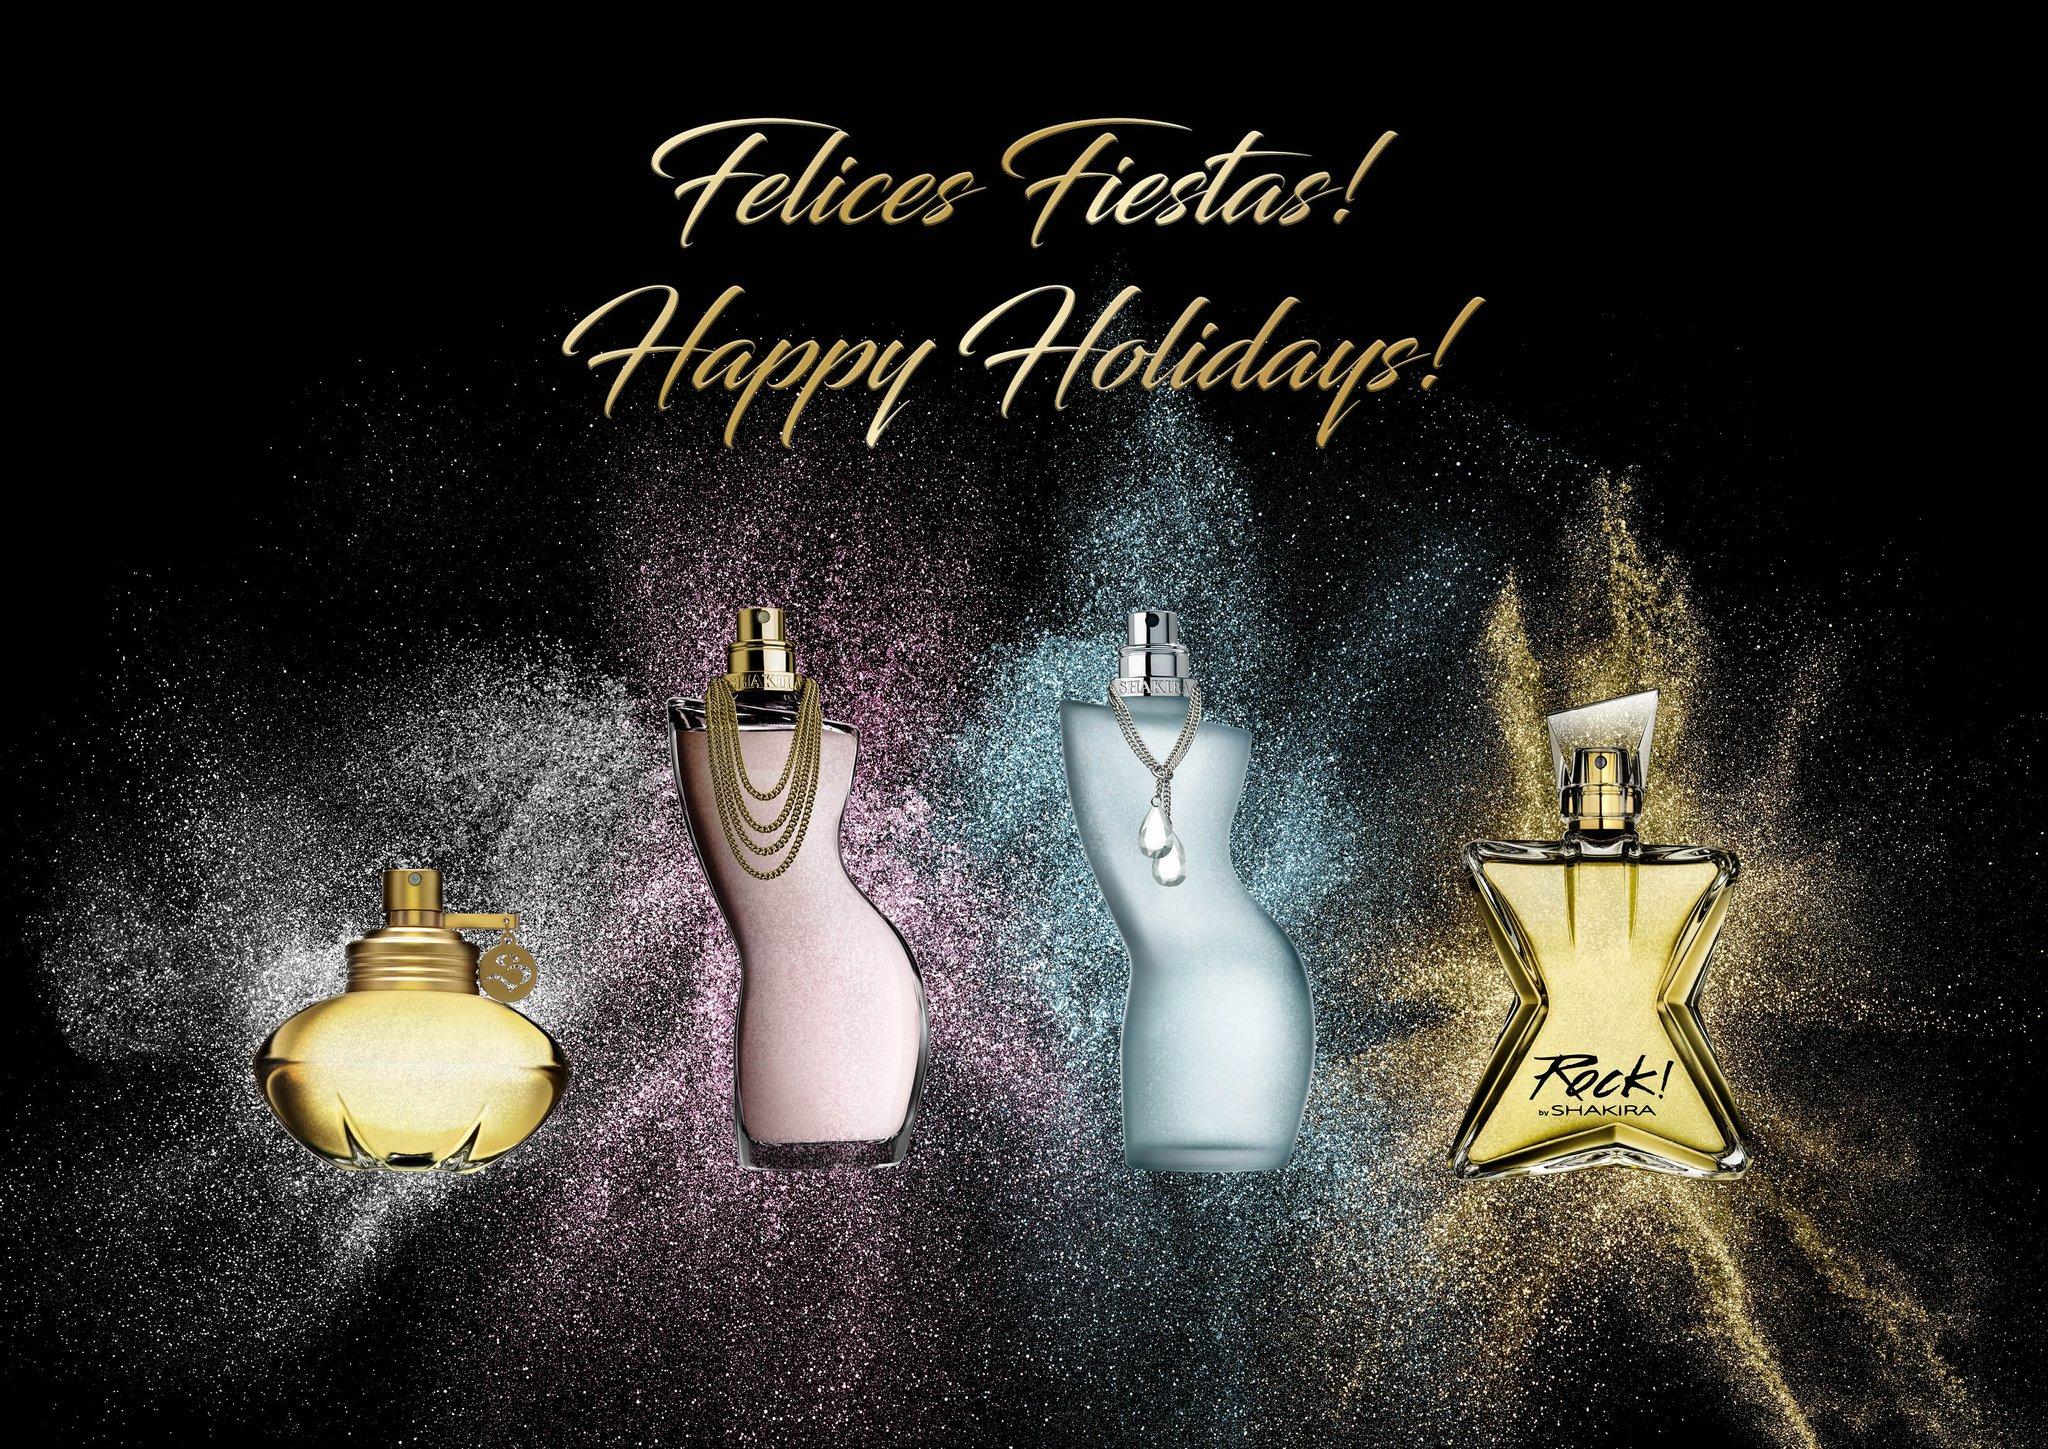 Happy Holidays! Felices Fiestas! https://t.co/faS3434zhY  ShakHQ https://t.co/Cof0VpKOFU